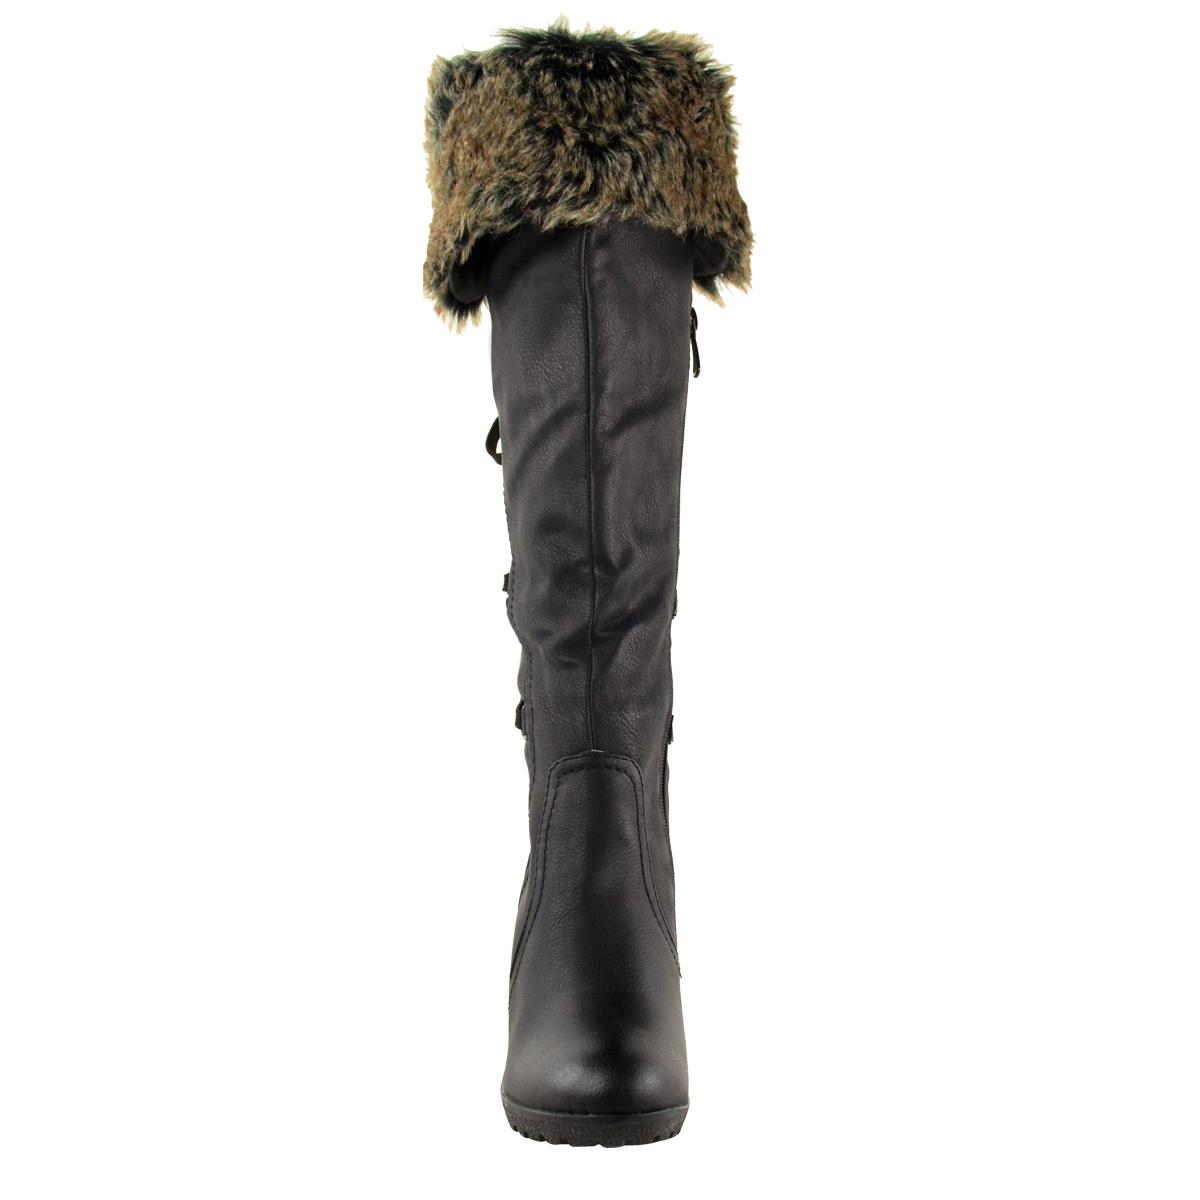 Womens-Ladies-Wedge-Low-Heel-Winter-Knee-Boots-Warm-Faux-Fur-Fleece-Size-UK thumbnail 5